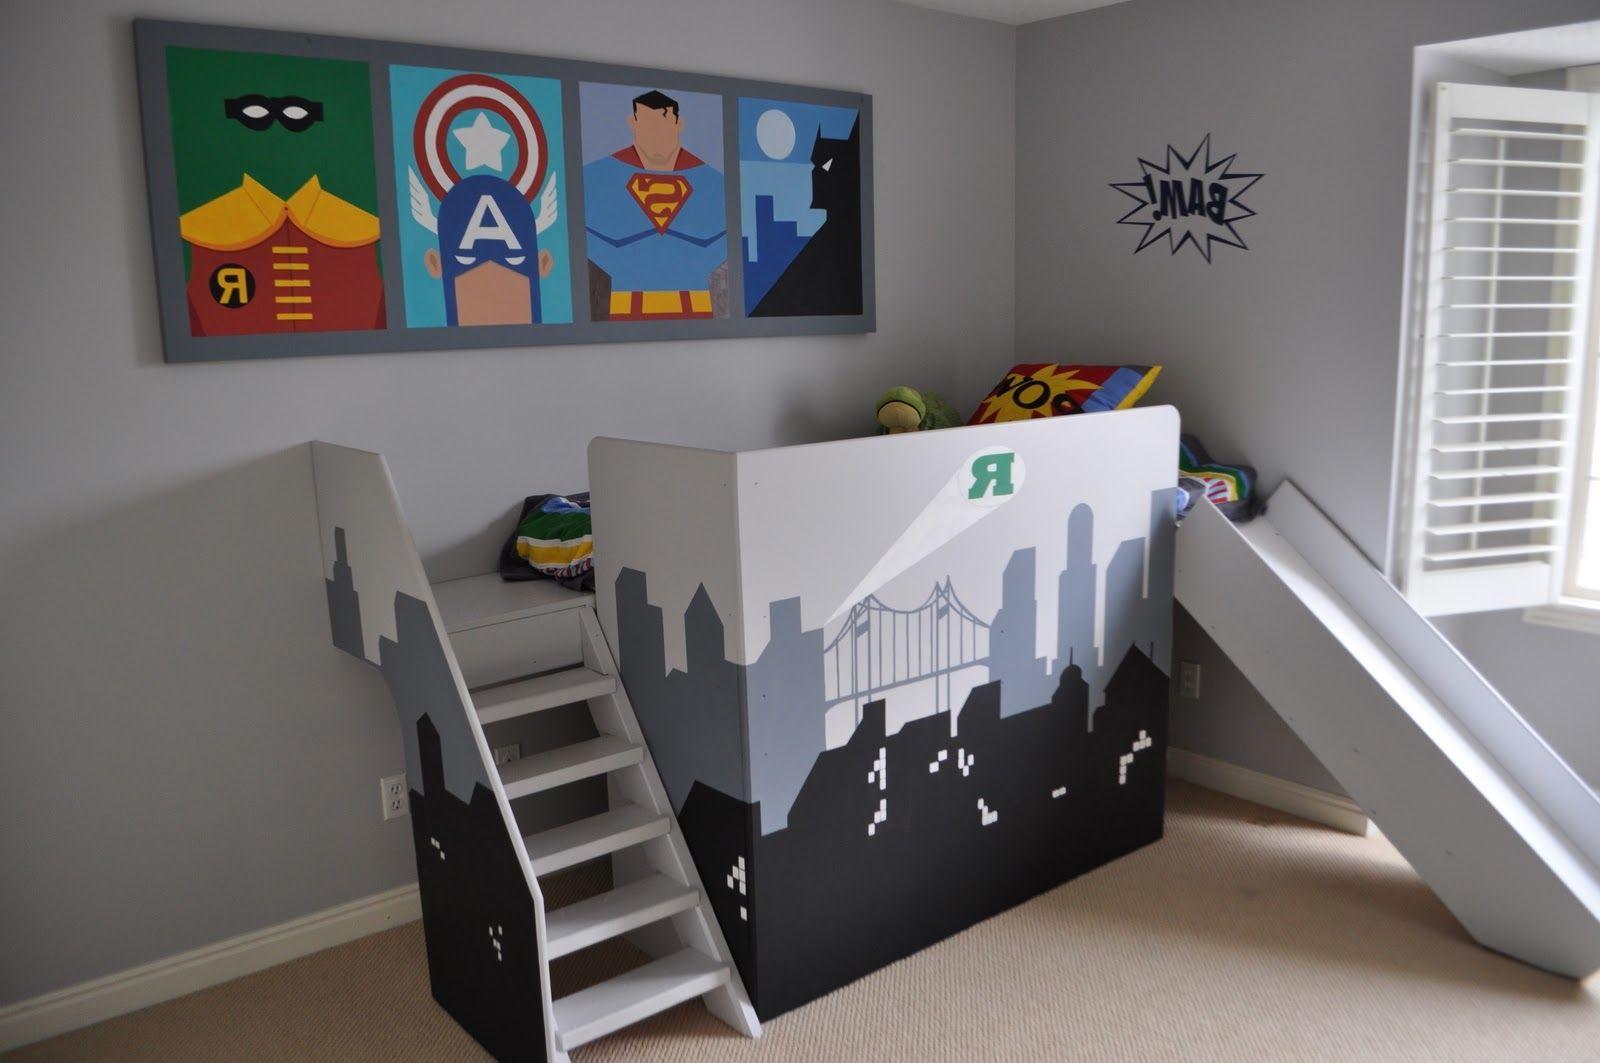 Room decor ideas diy cool bunk beds for kids girls cheap but wall